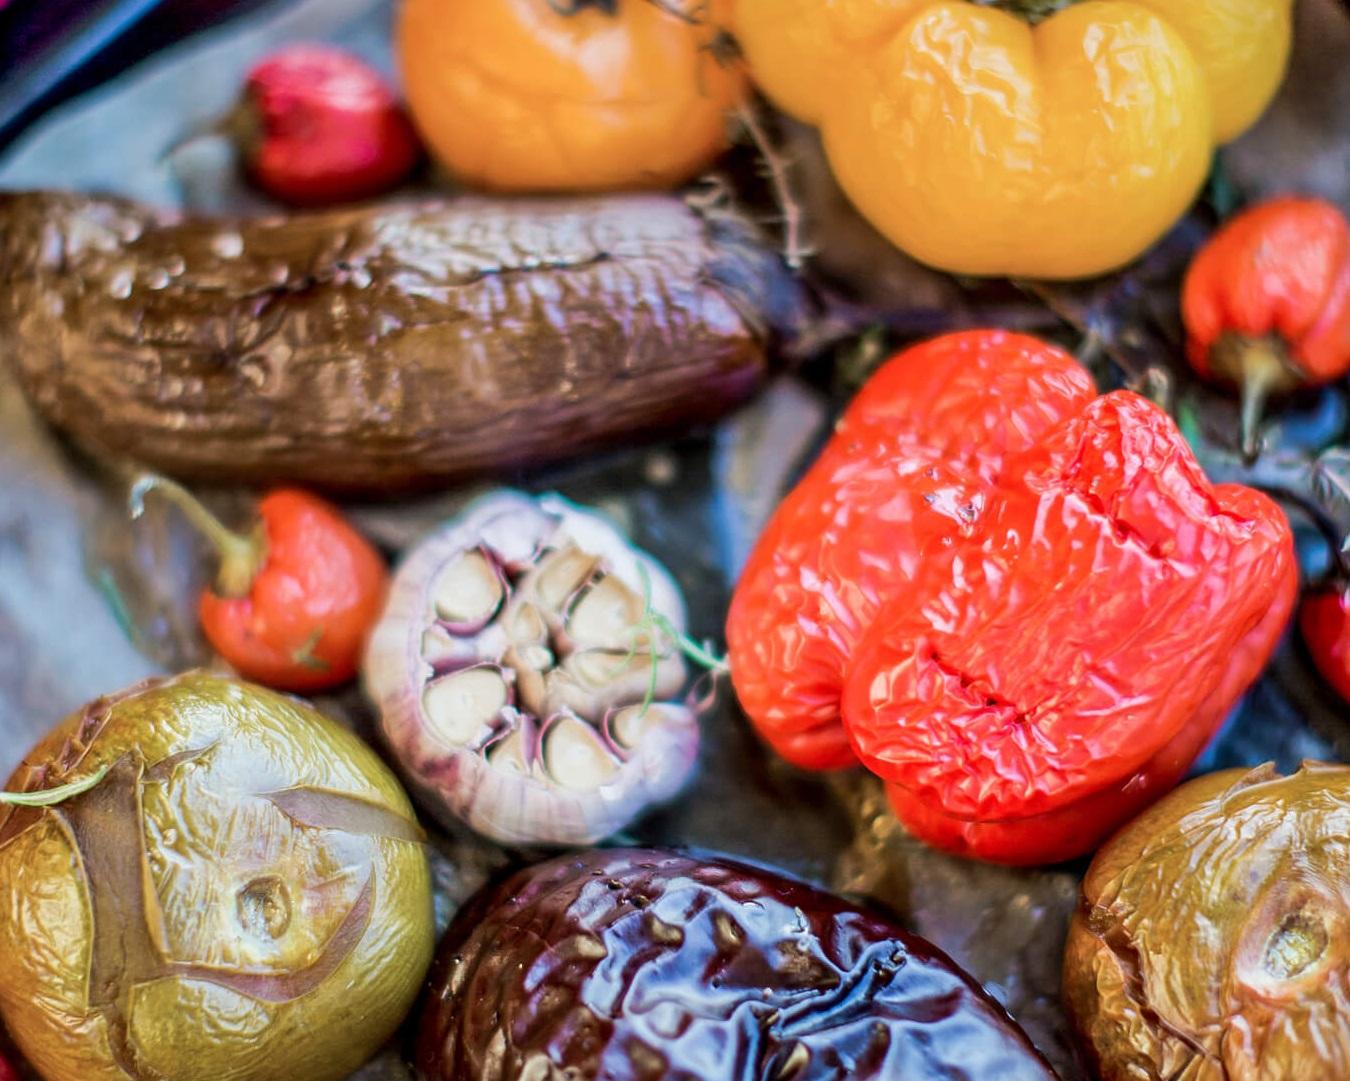 Smoked vegetable in combi oven